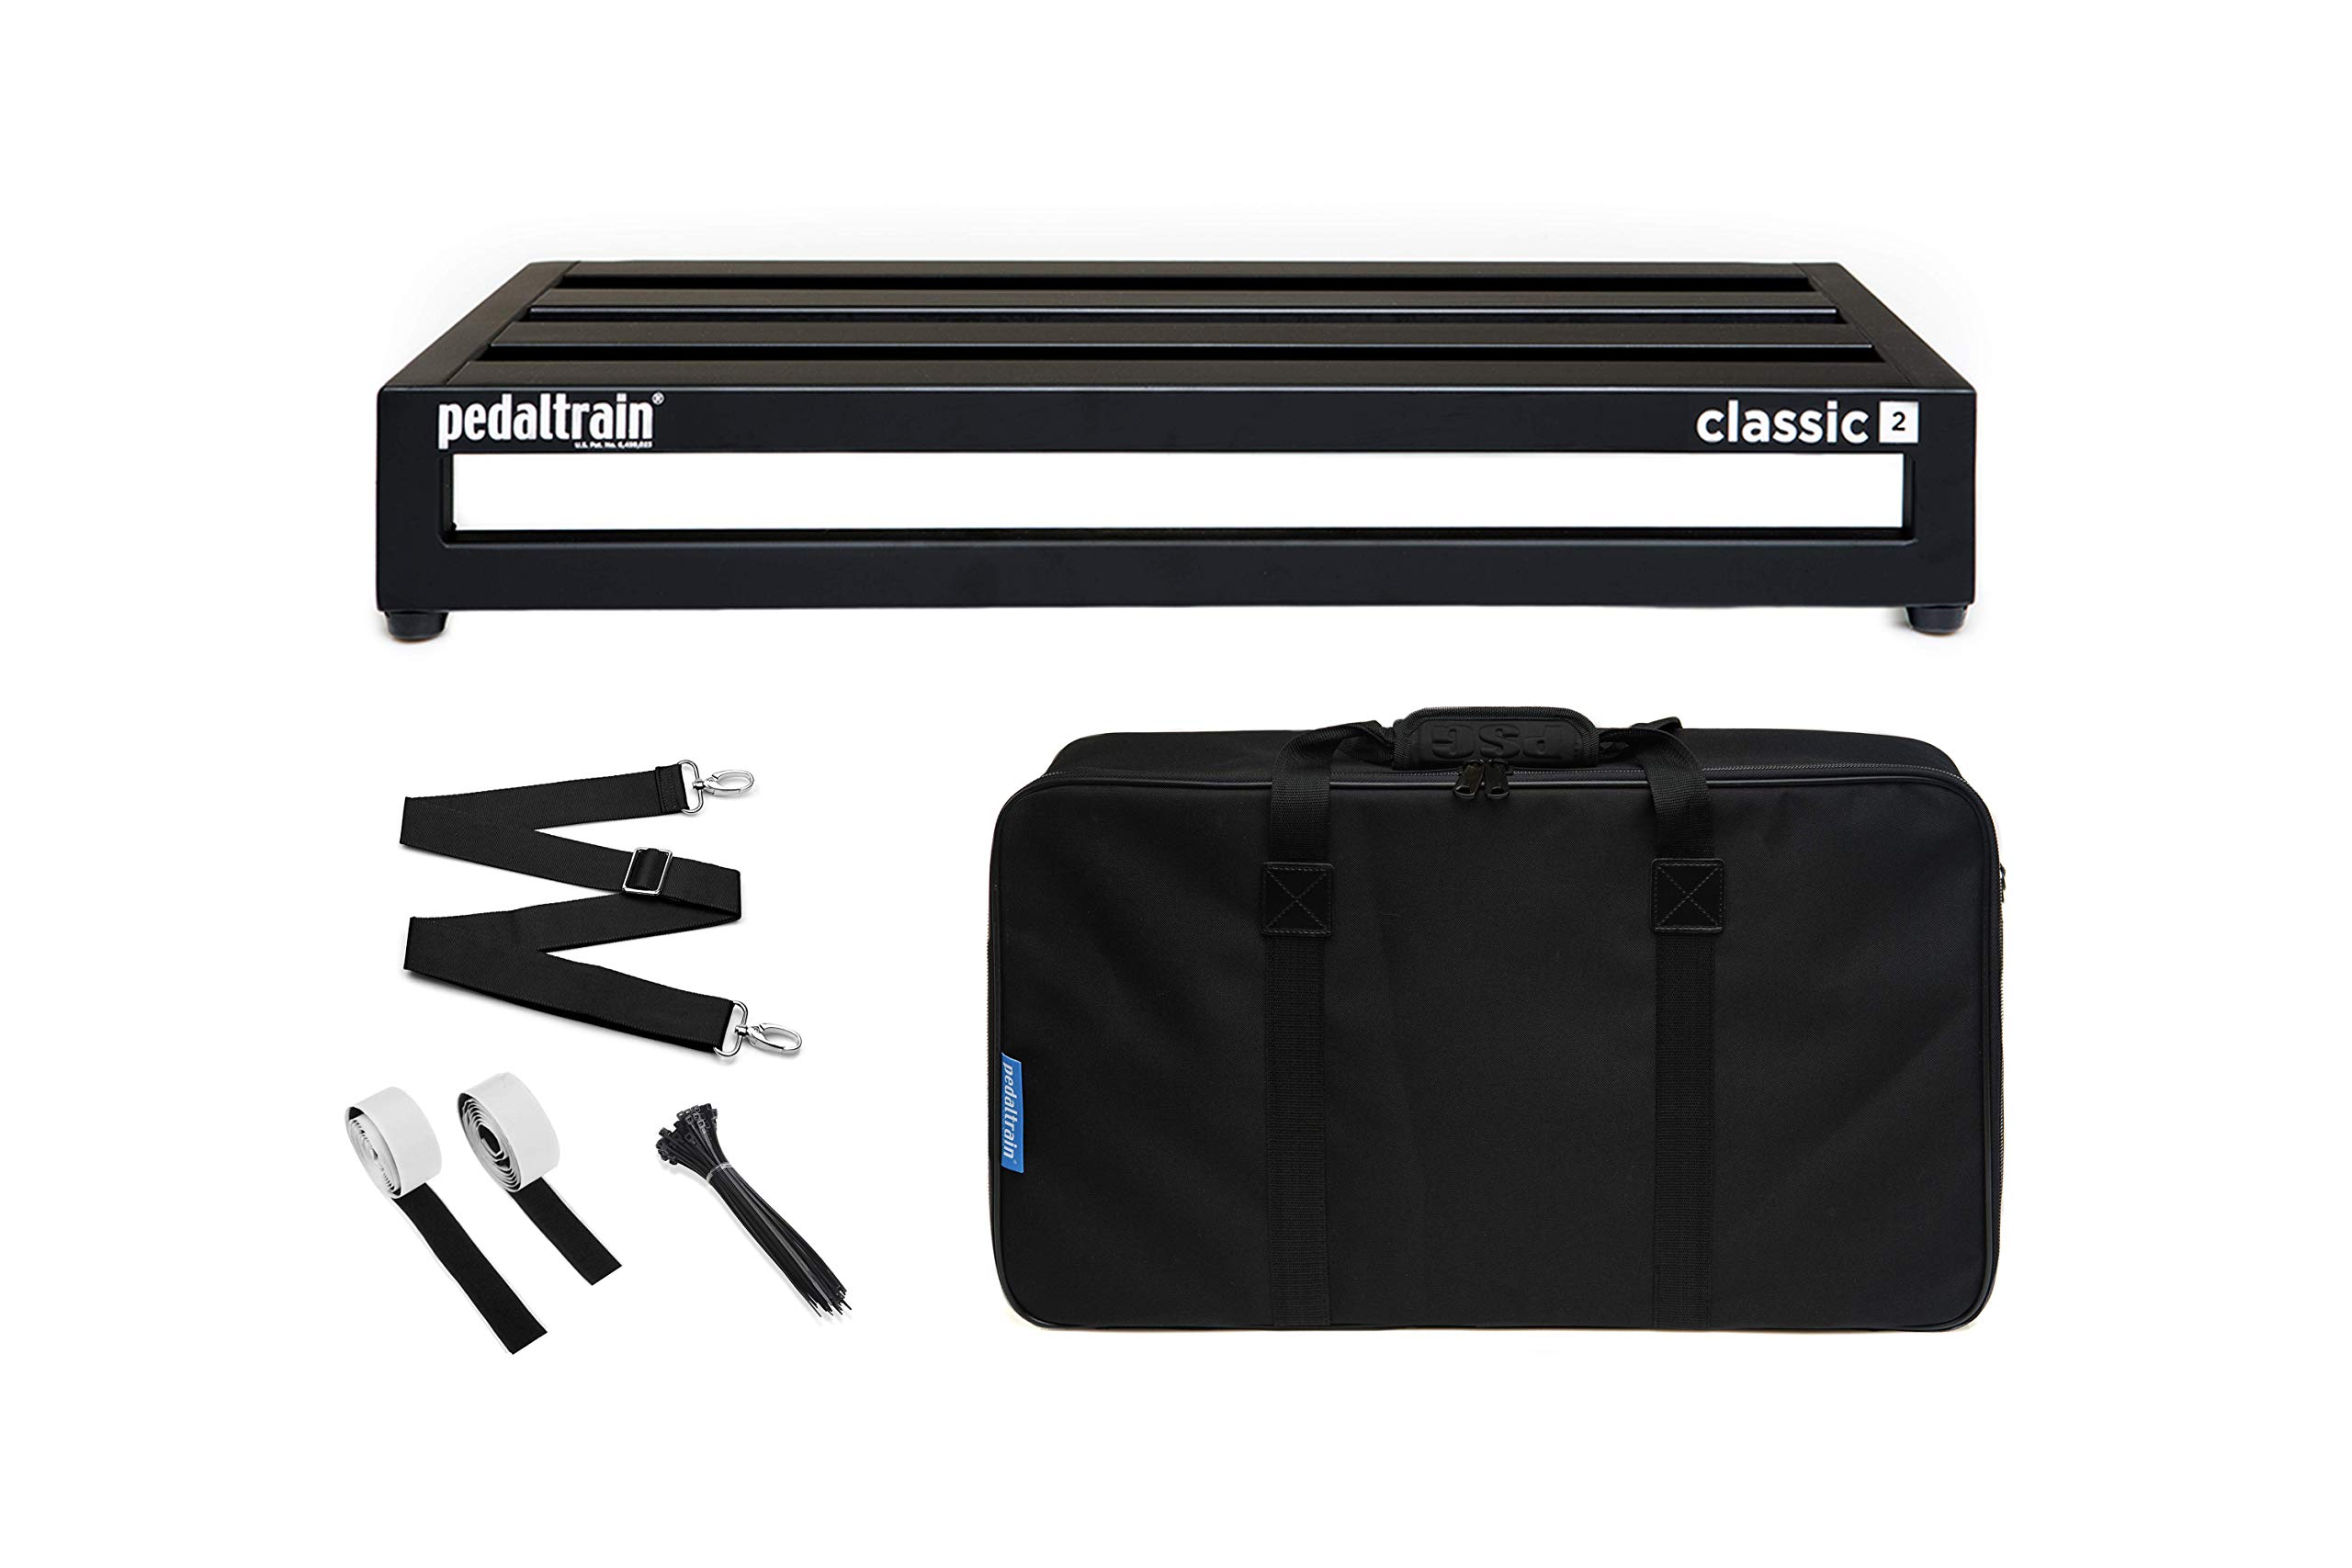 PT-CL2-SC Pedaltrain Classic 2 w/soft case by Pedaltrain